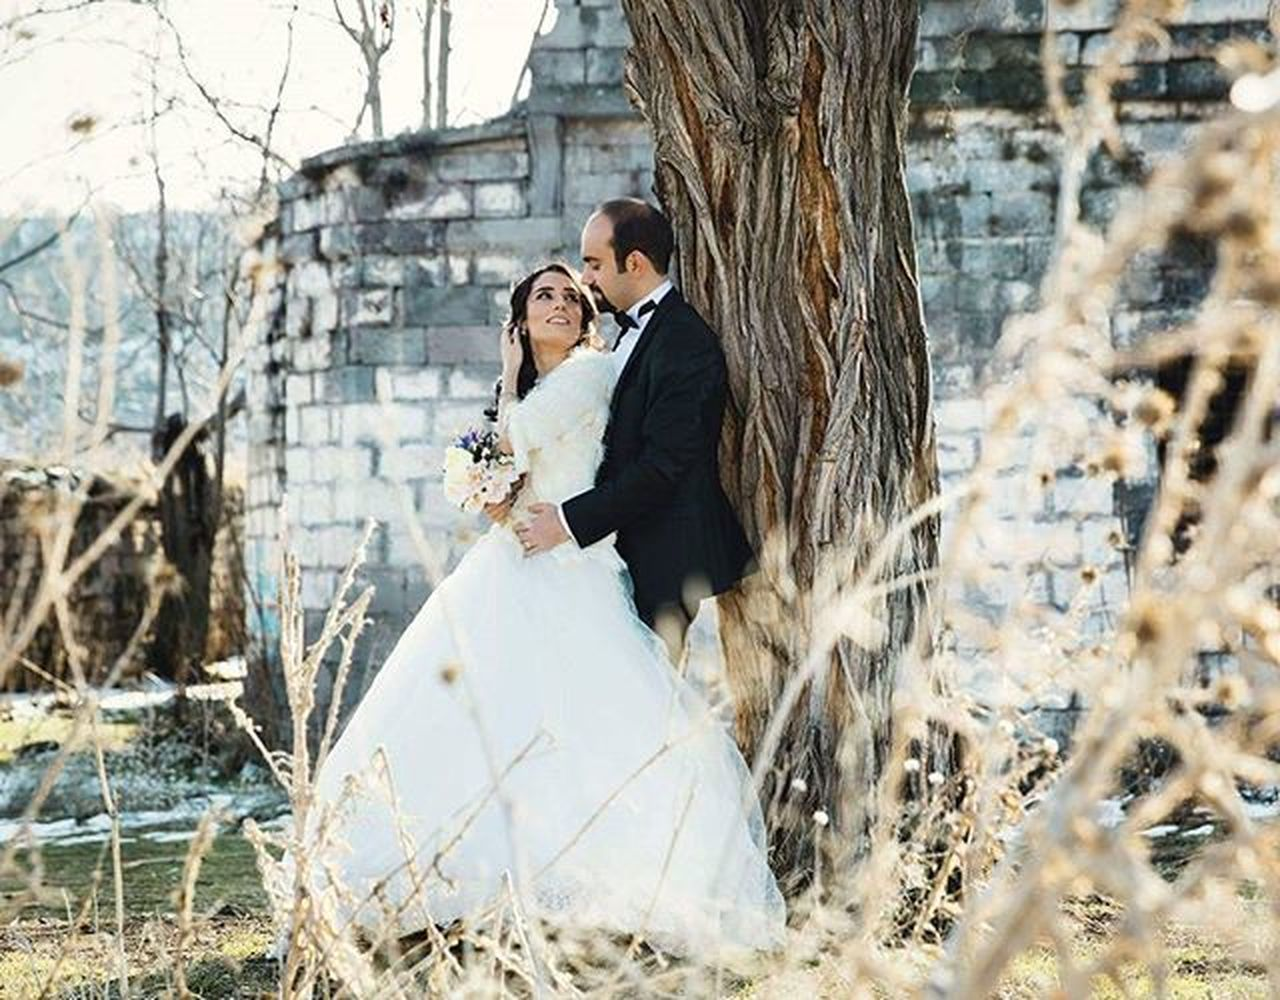 Onur&Nihan photo:@mrrywedding makeup:@evrimmemili accessorise:@be.boutique Wedding Weddingphotography Weddingaccessories Bride Groom Love Dugunfotografi Dugunfotografcisi Dugun Gelin Gelinmakyajı Fotograf NİSAN Enmutlugun Kayseri Aşk